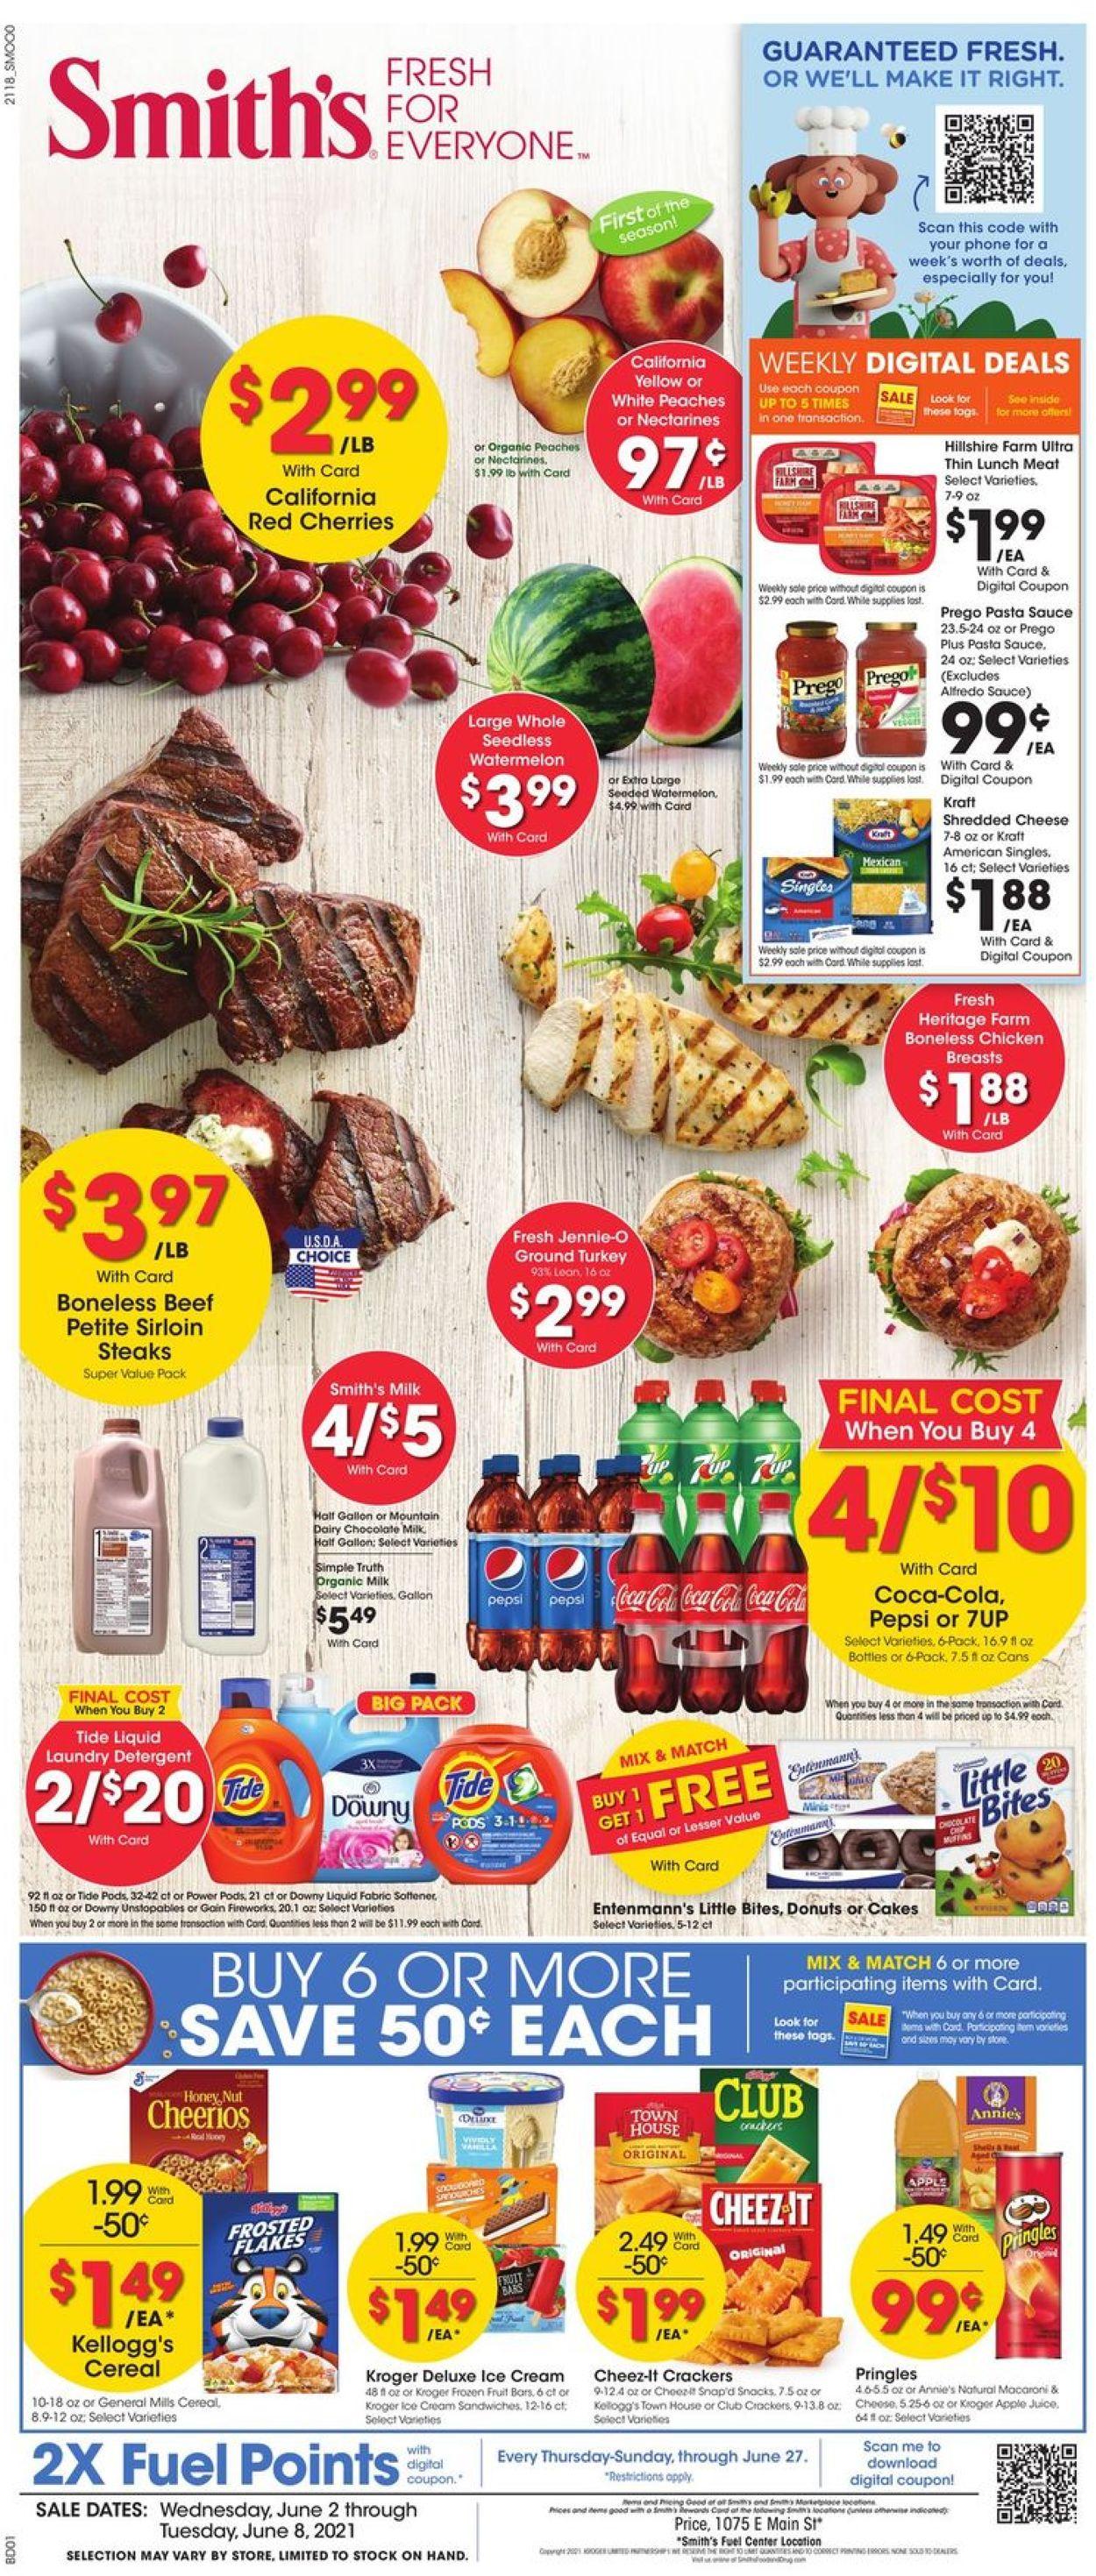 Smith's Weekly Ad Circular - valid 06/02-06/08/2021